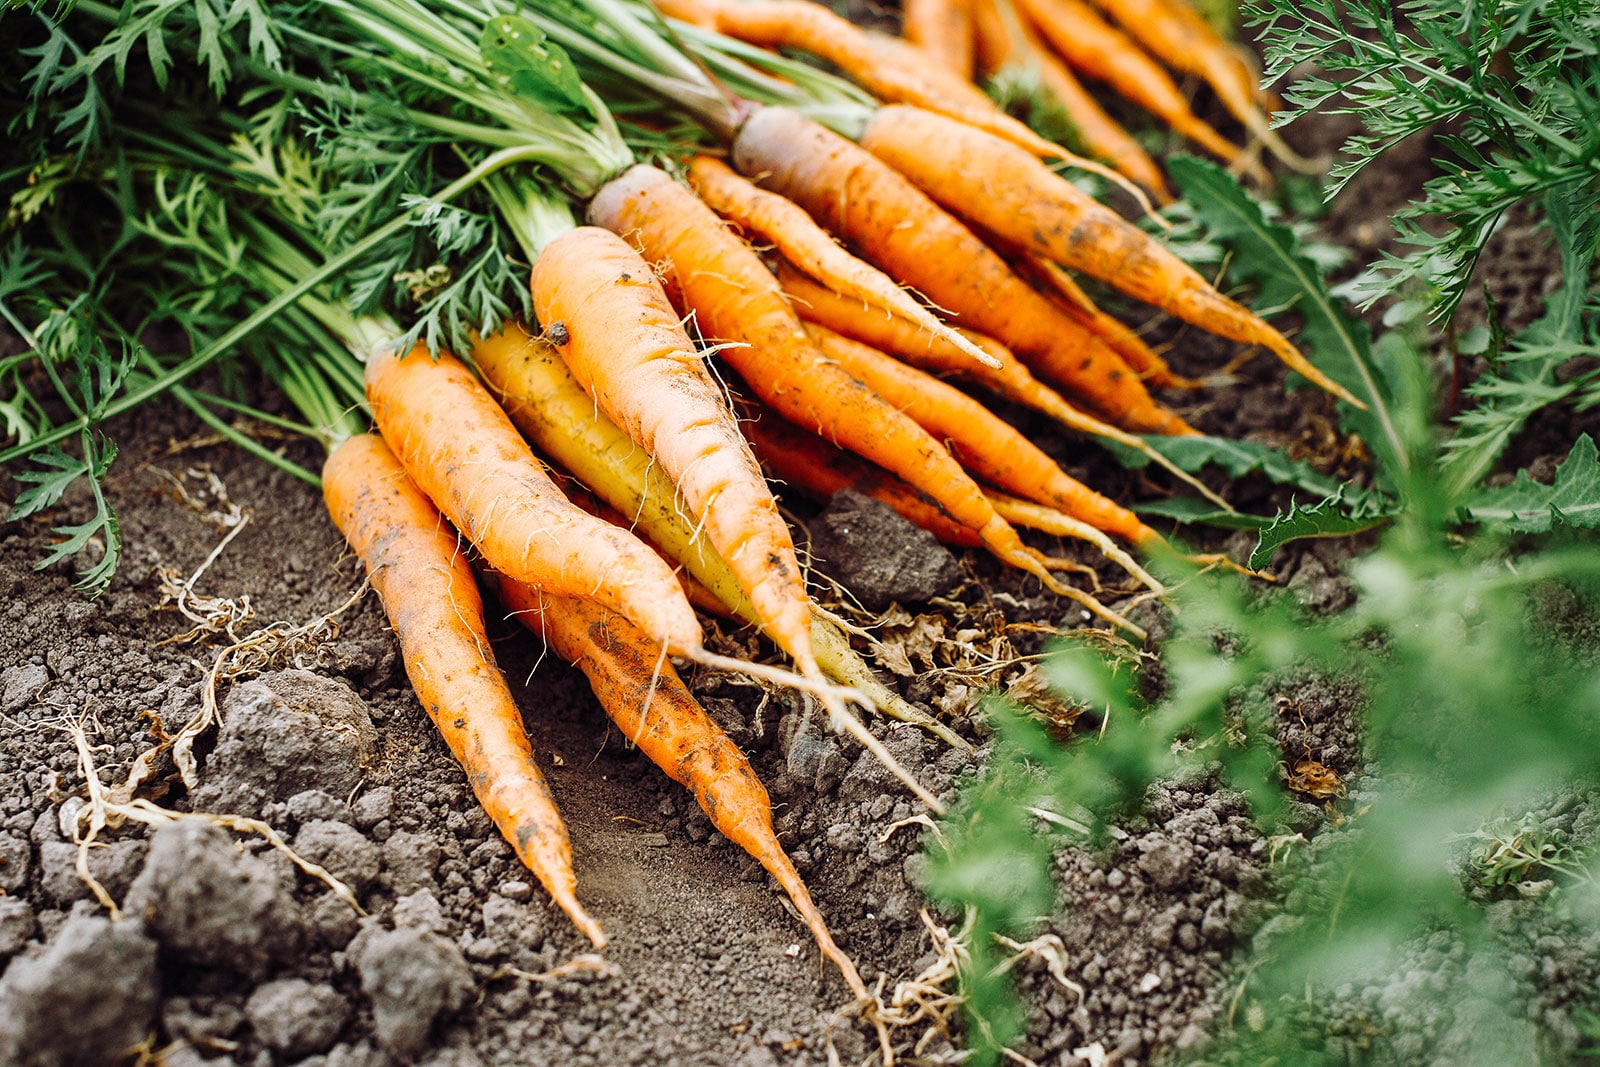 Freshly harvested orange carrots in a garden